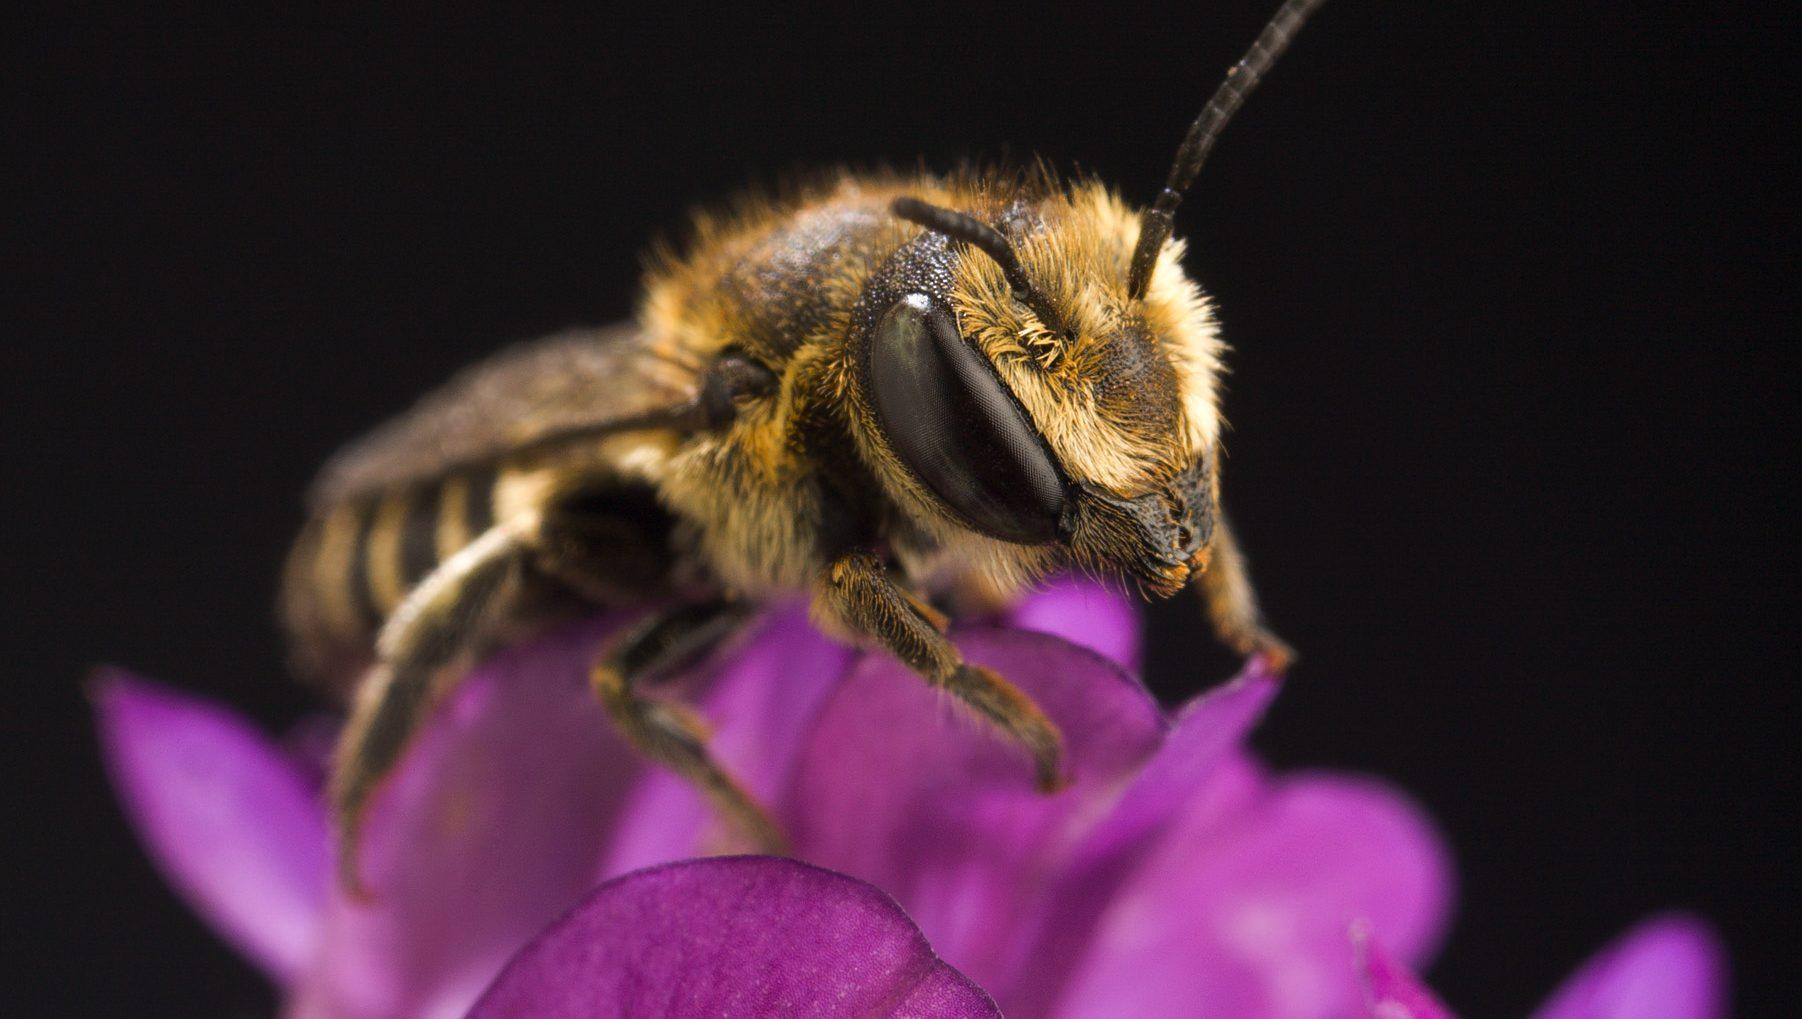 Image: Alfalfa Leafcutter Bee sitting on an alfalfa flower